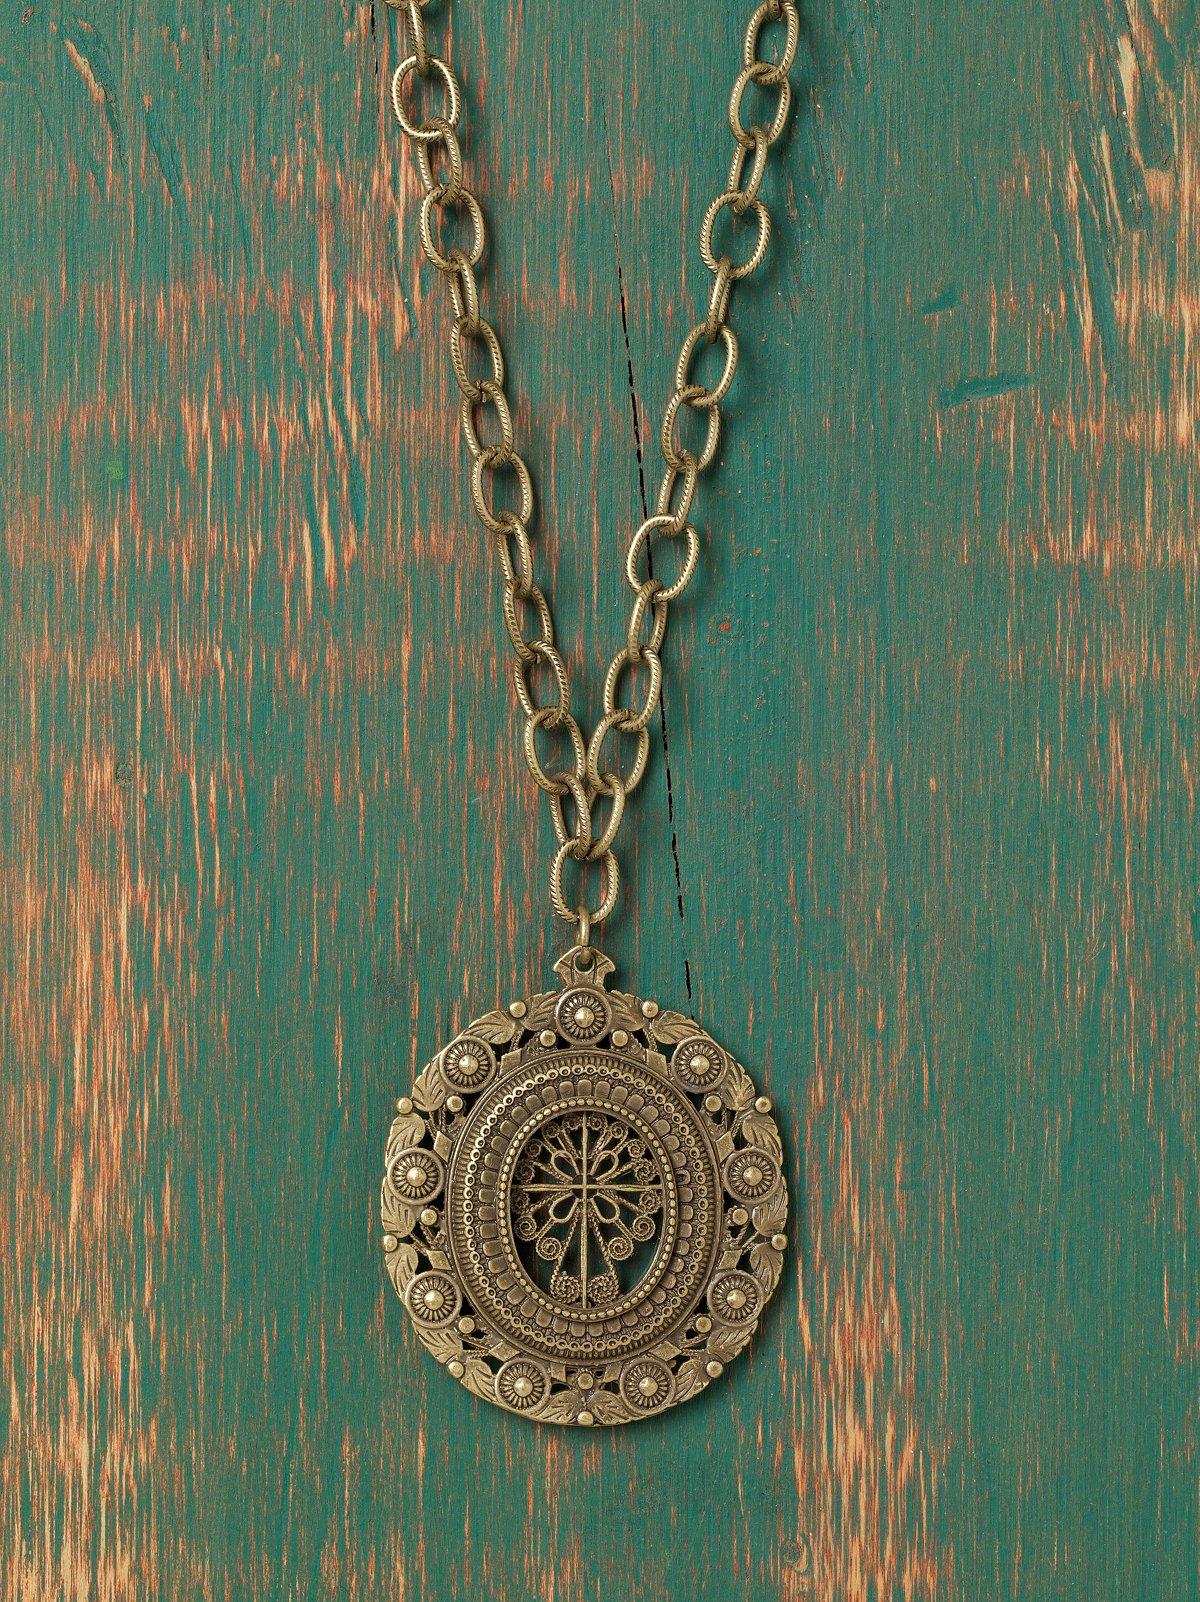 Secara Engraved Pendant